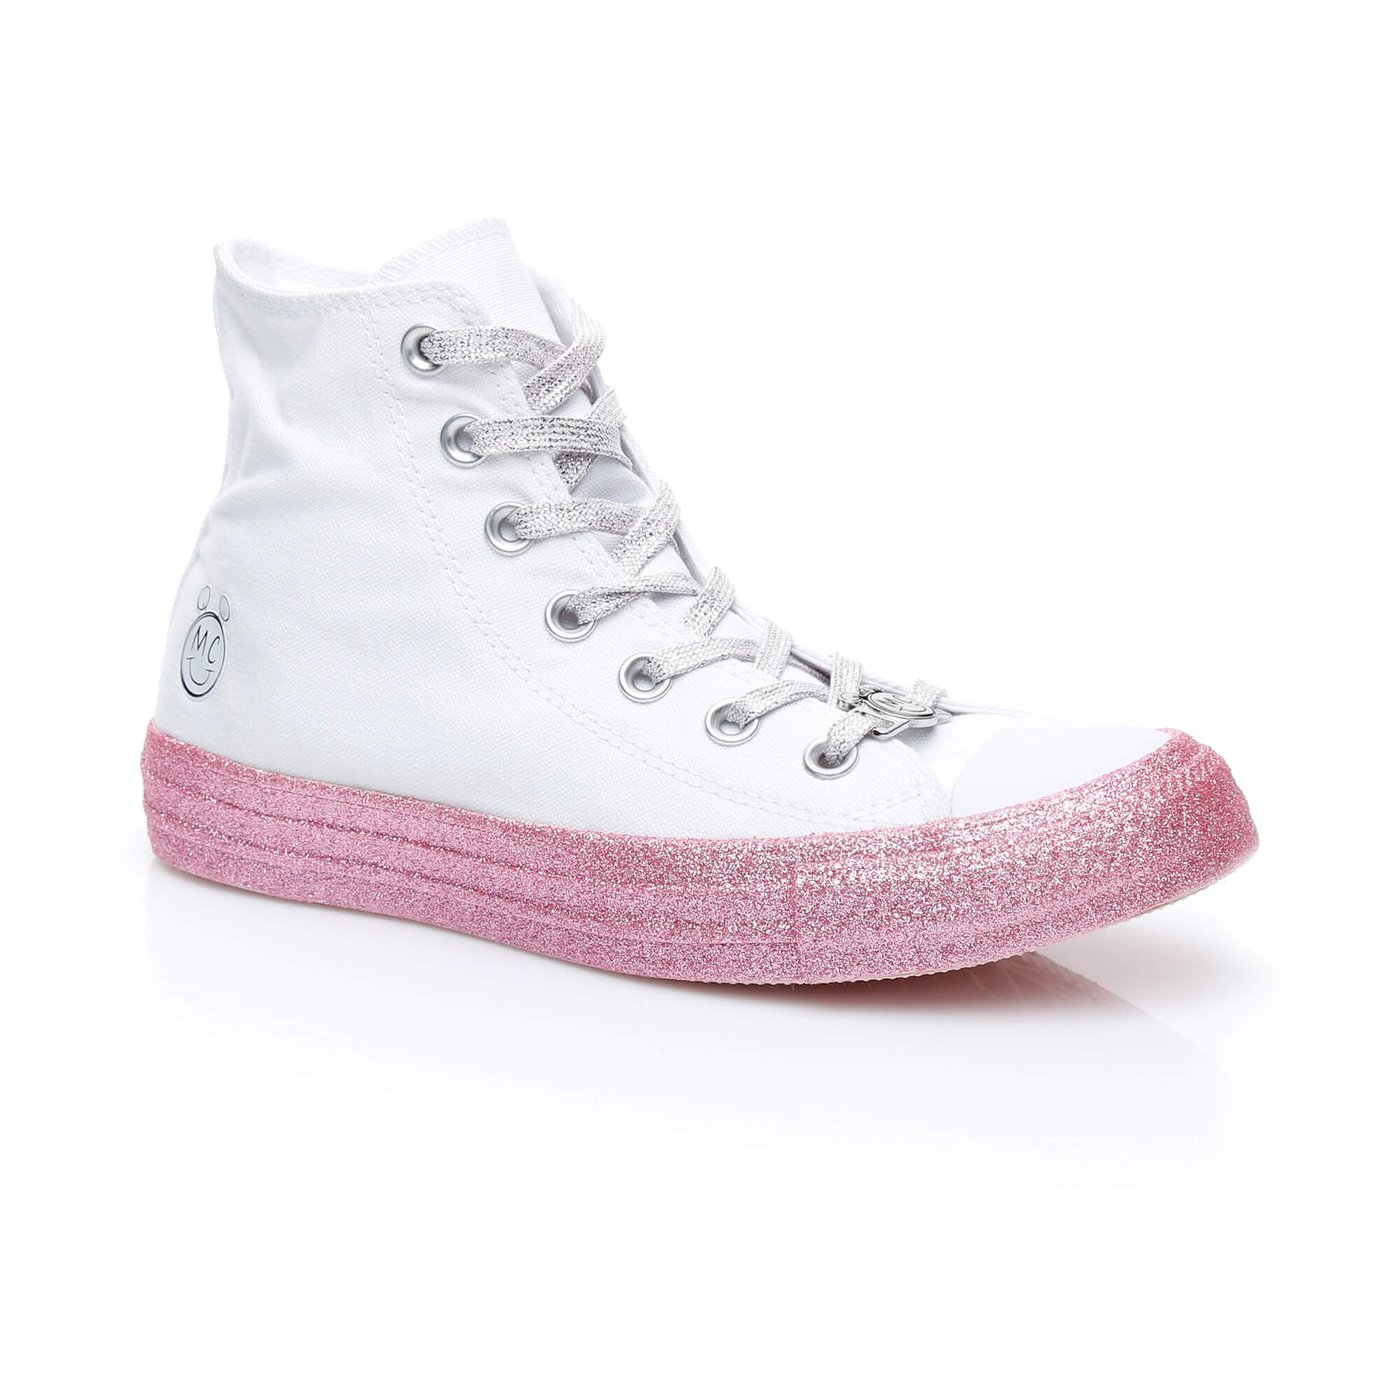 Converse X Miley Cyrus Chuck Taylor All Star ''Glitter'' Mid Kadın Beyaz Sneaker